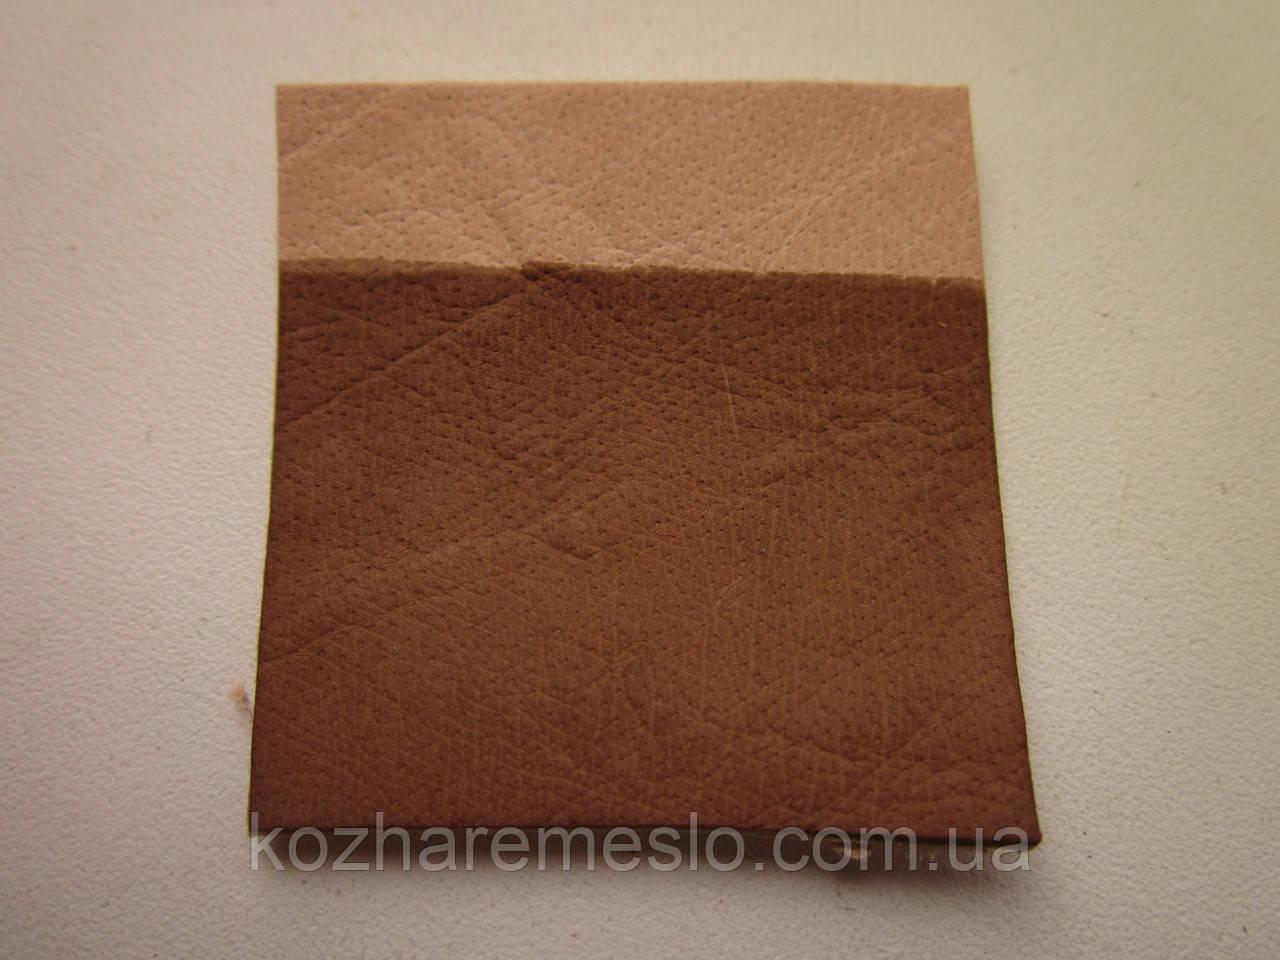 Краска для кожи спиртовая TOLEDO SUPER 100мл шоколад